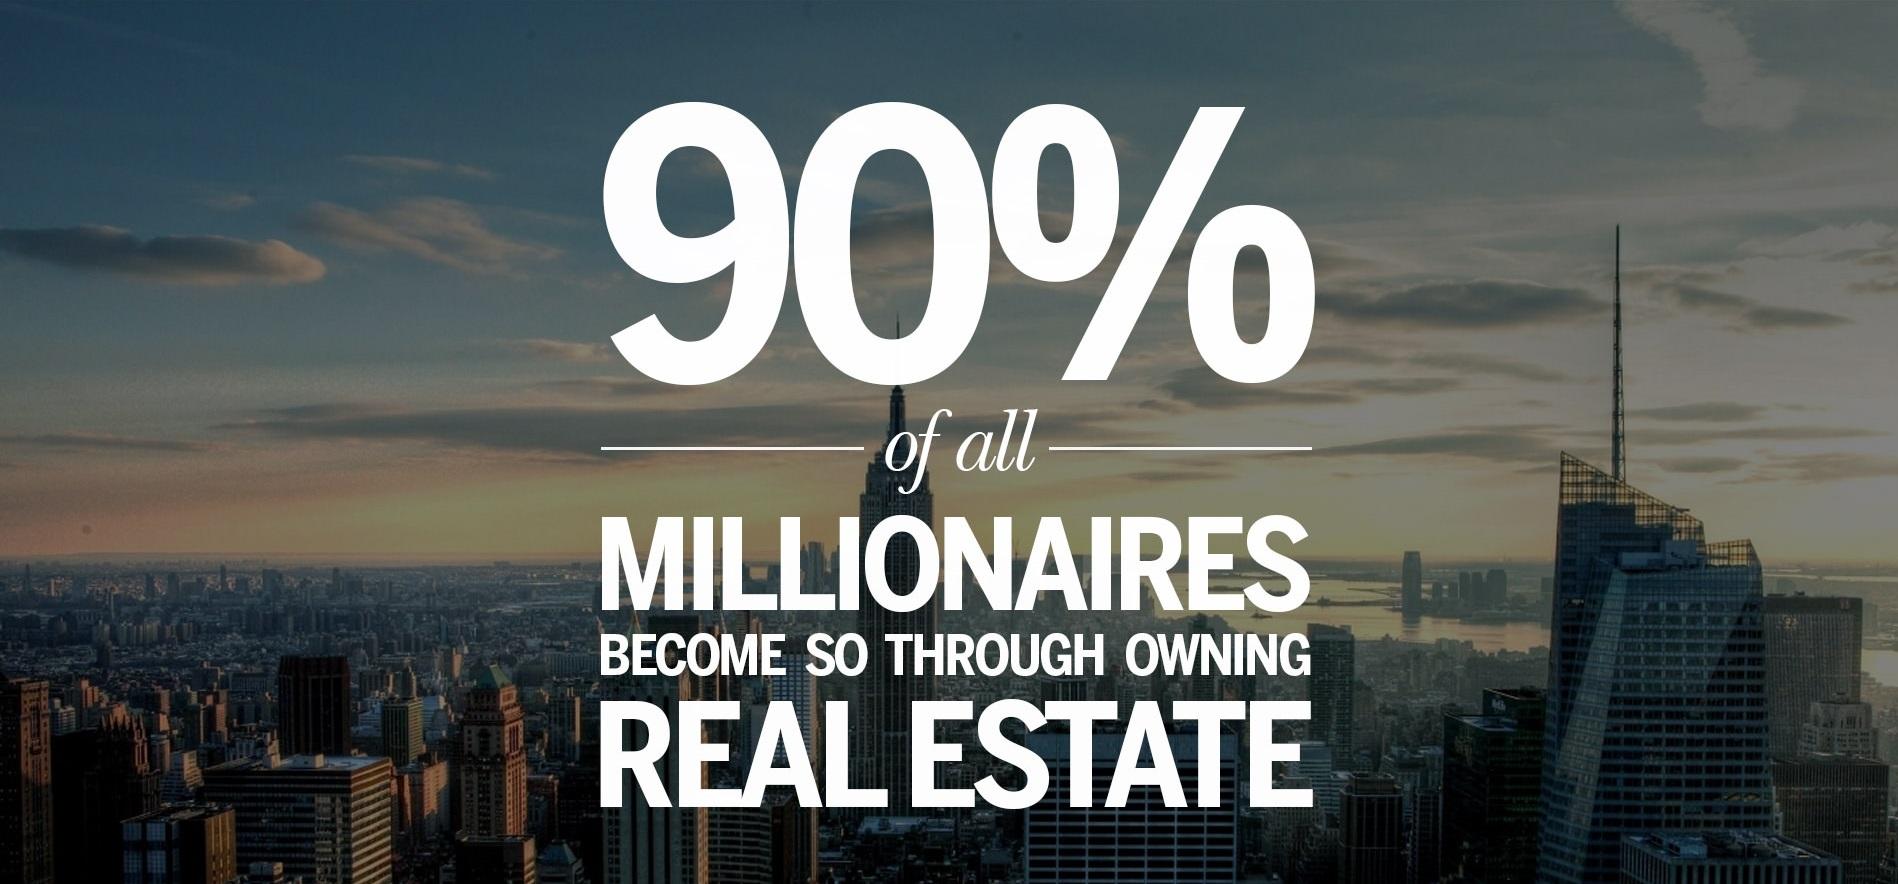 why real estate image.jpg